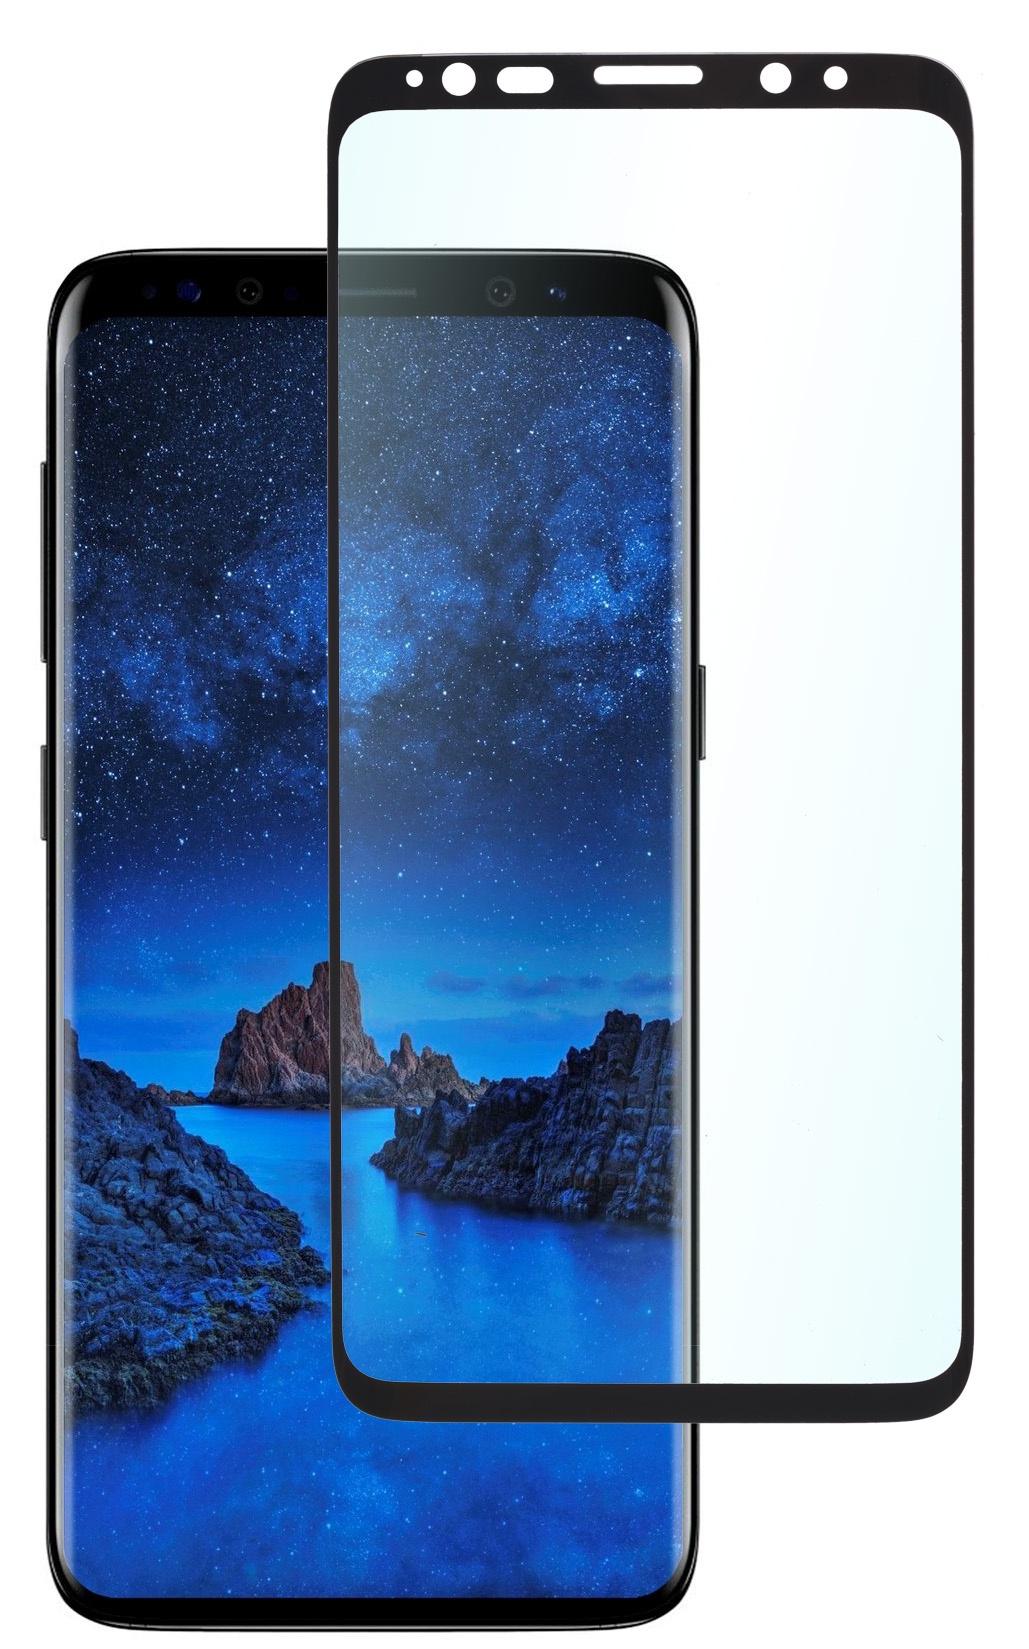 Защитное стекло skinBOX 3D full glue, 4660041406443 аксессуар защитное стекло для samsung galaxy s8 media gadget 3d full cover glass full glue black frame mg3dgsgs8fgbk